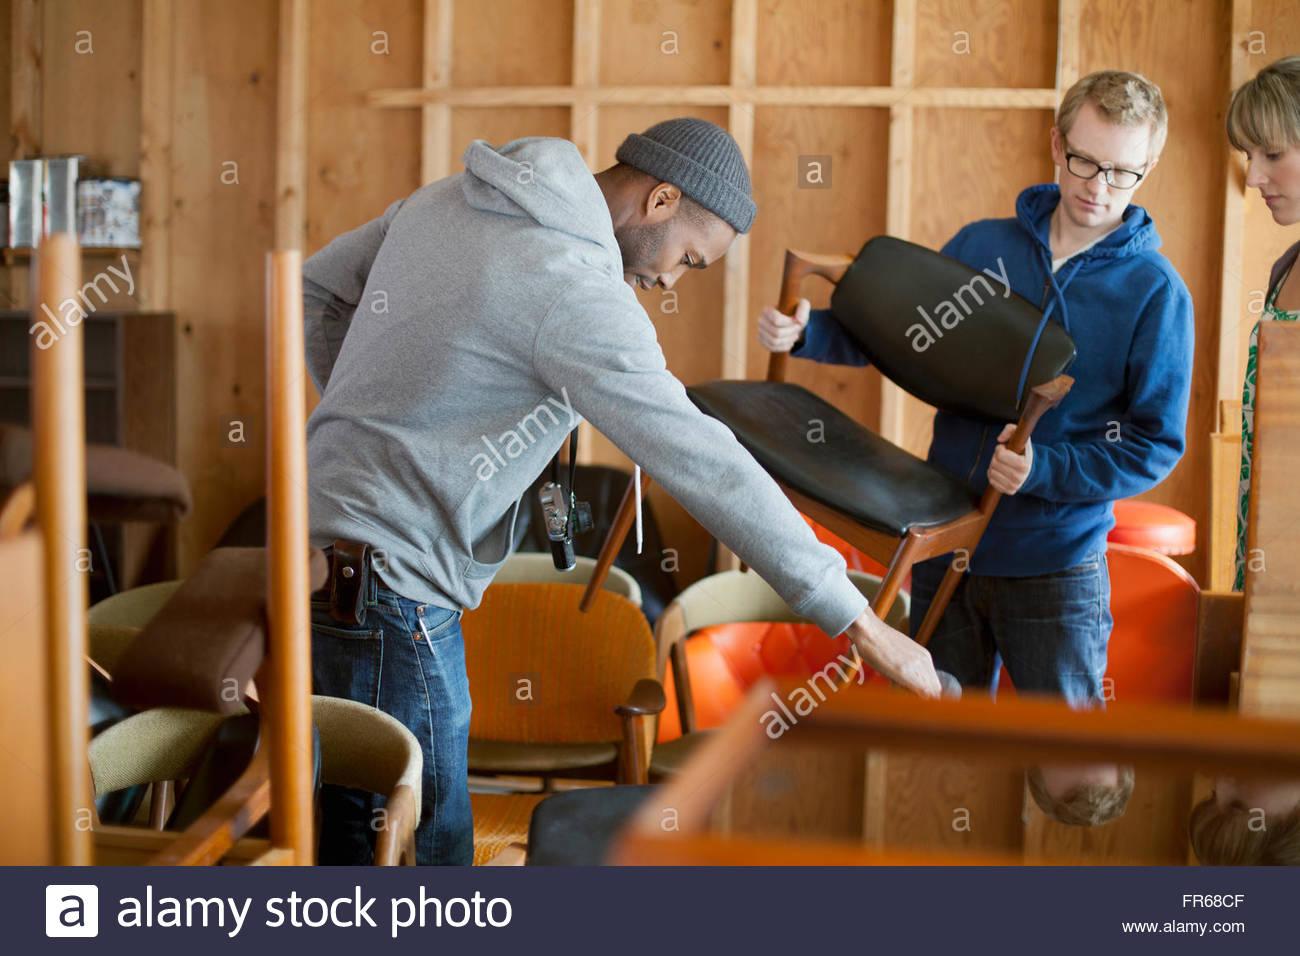 Freunde hängen in Werkstatt Stockbild